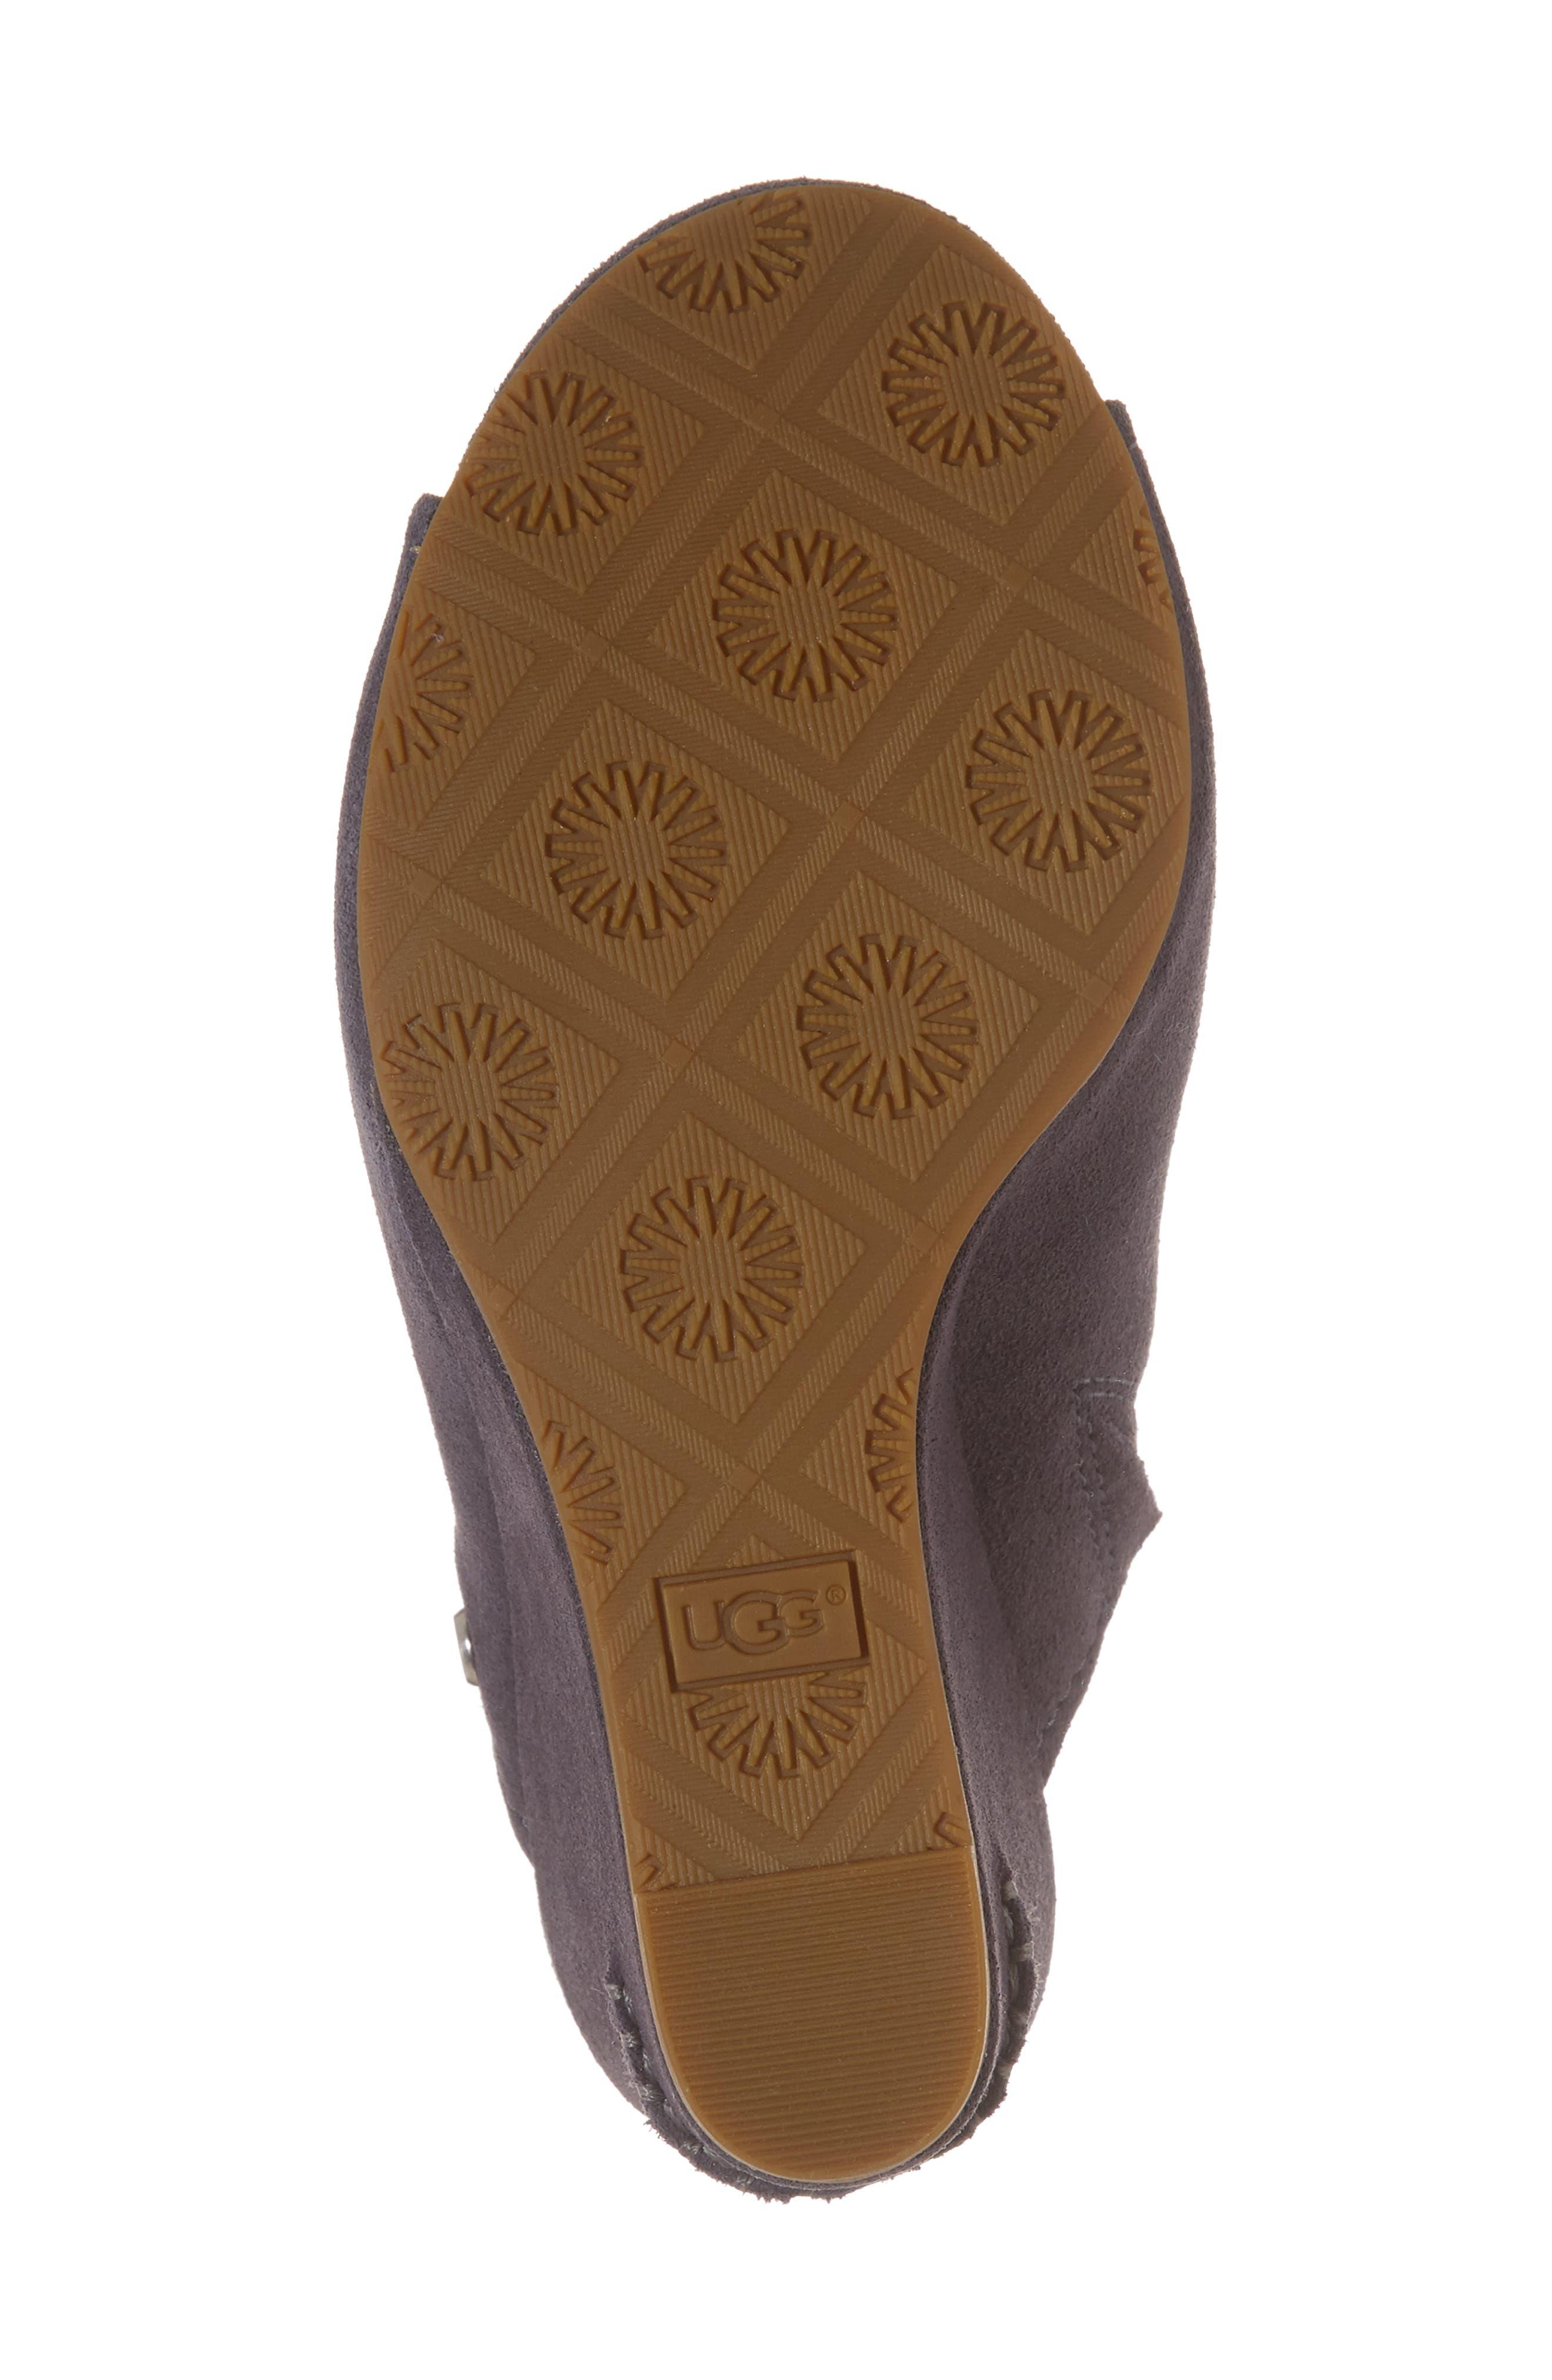 Lively Wedge Slide Sandal,                             Alternate thumbnail 6, color,                             Excalibur Suede